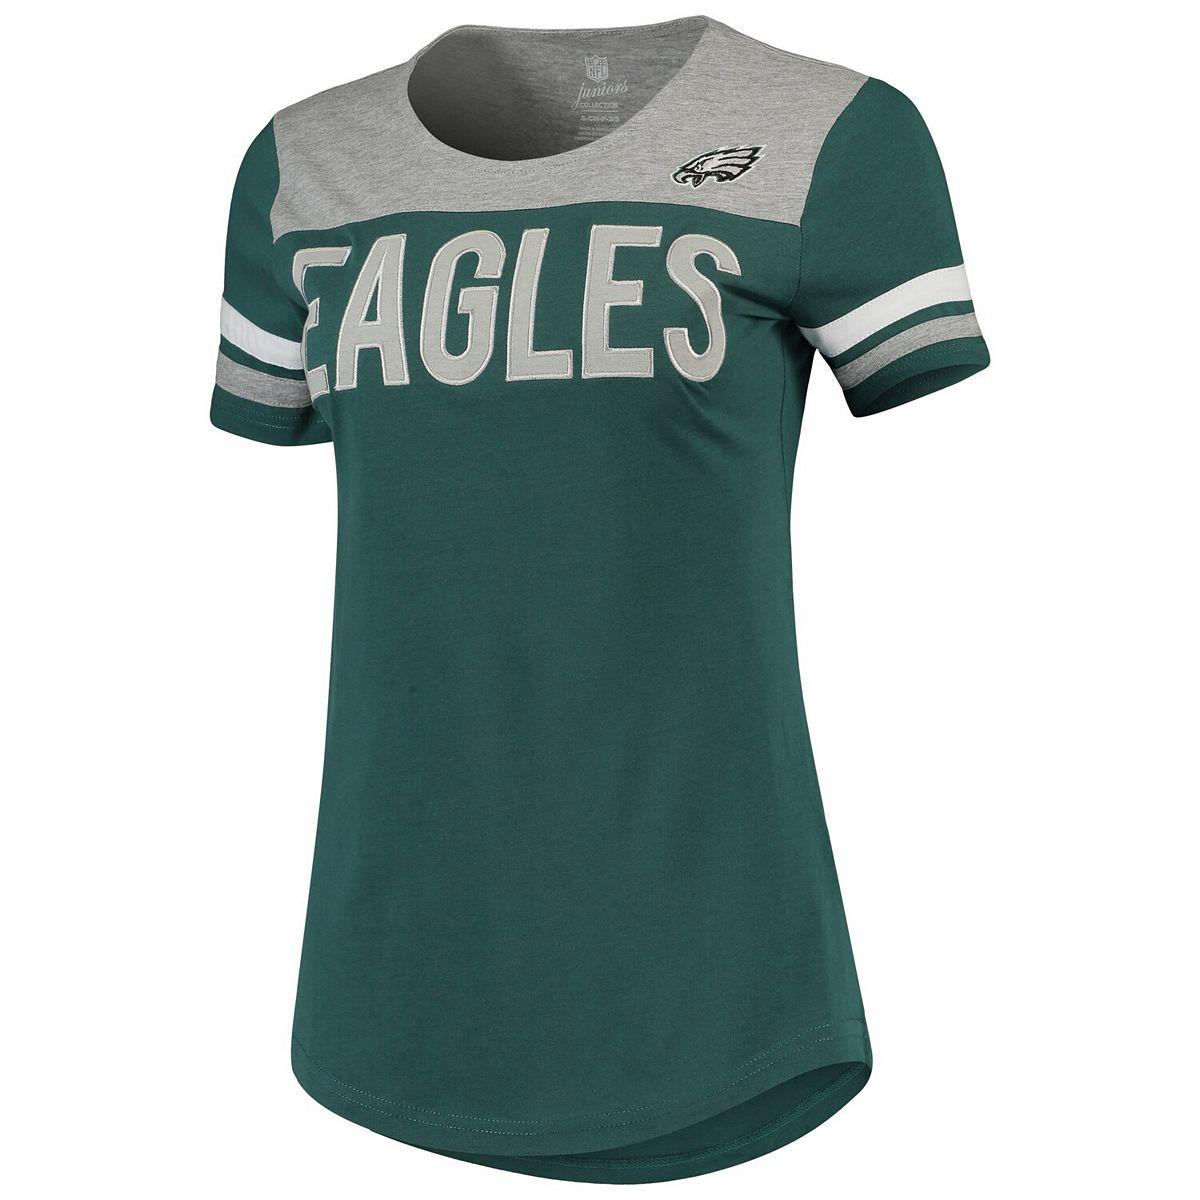 Juniors Midnight Green/Heathered Gray Philadelphia Eagles Receiver T-Shirt W2xku